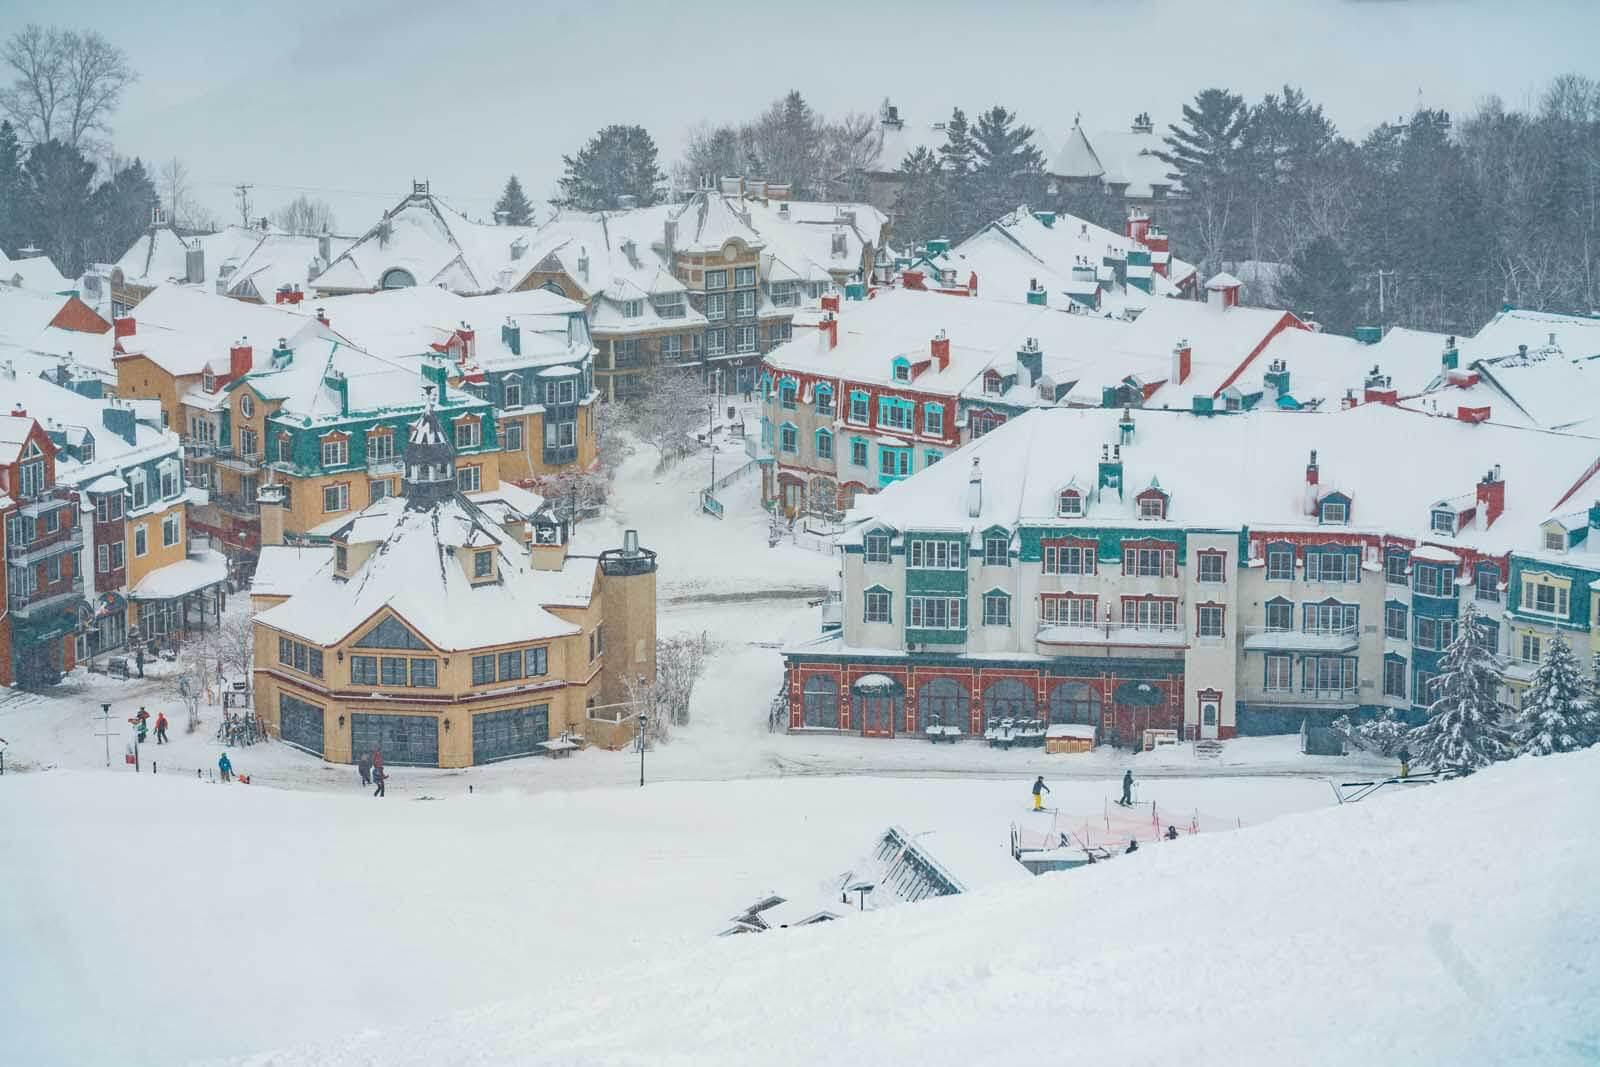 Winter in Mont Tremblant village